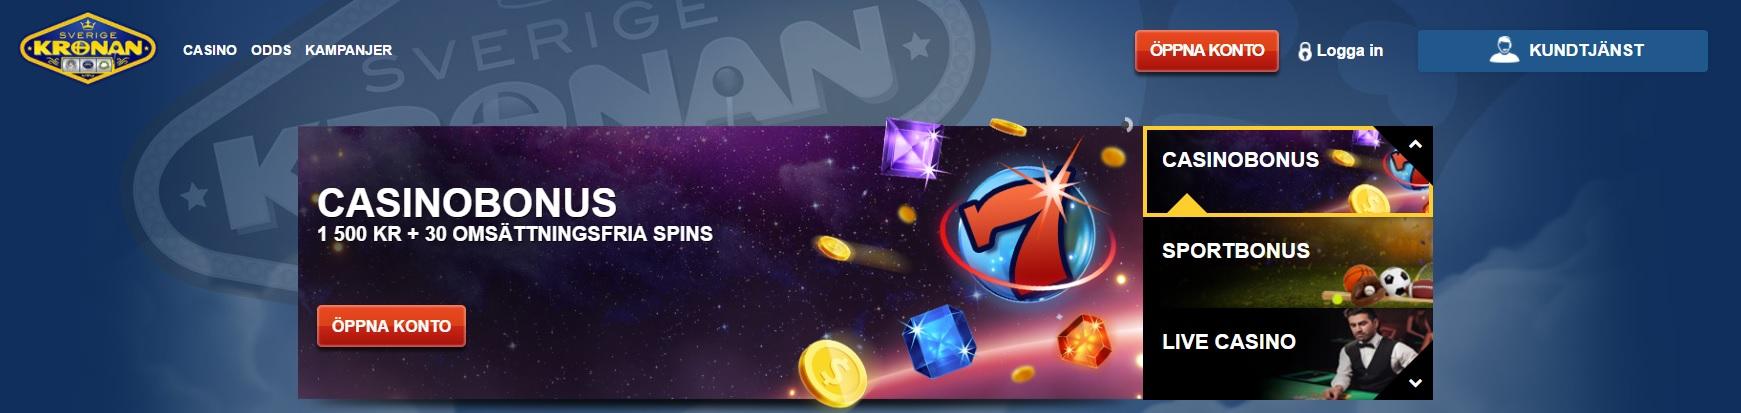 Casino kampanjer - 69523